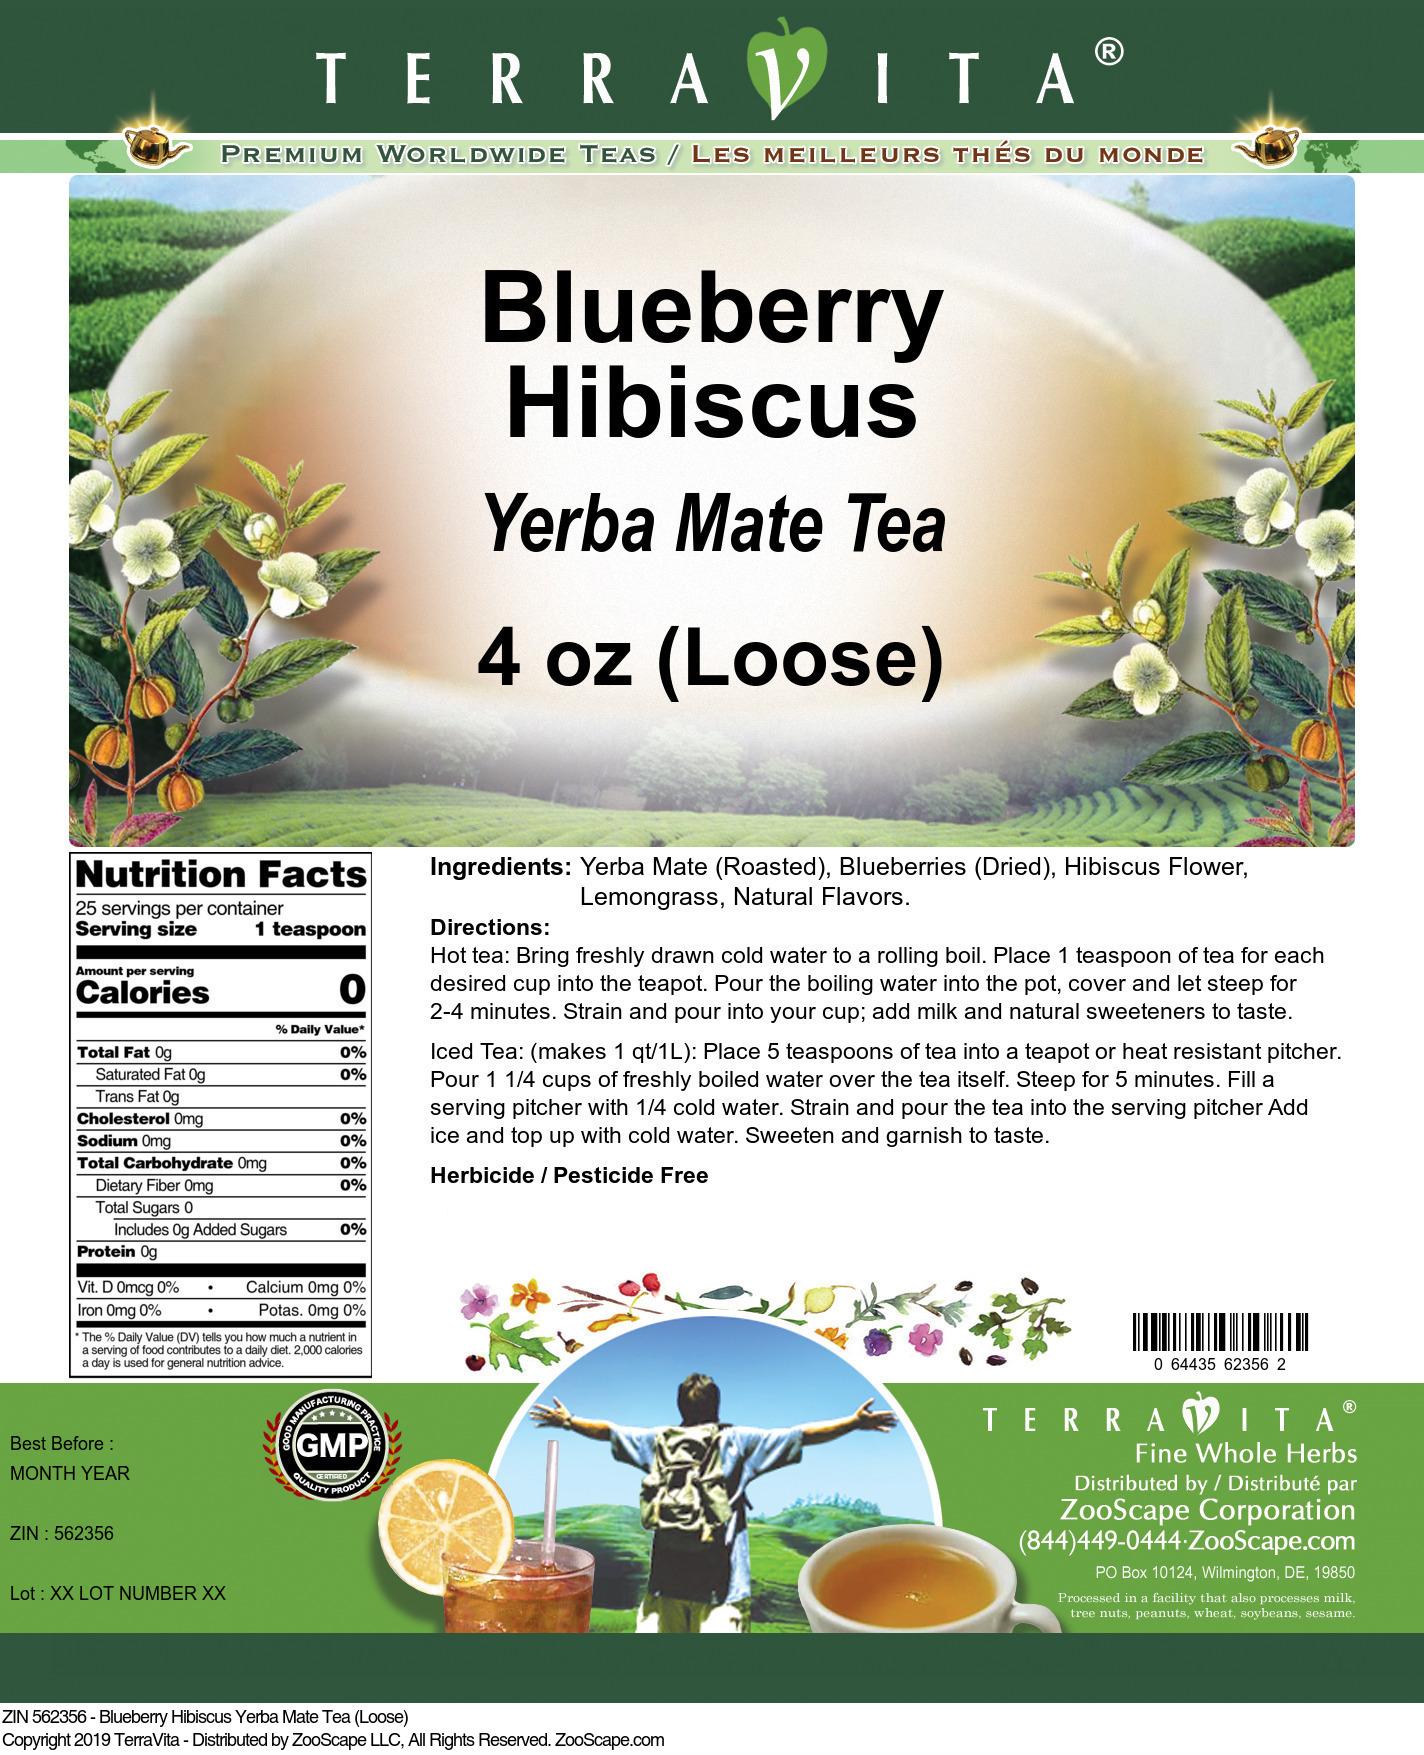 Blueberry Hibiscus Yerba Mate Tea (Loose)